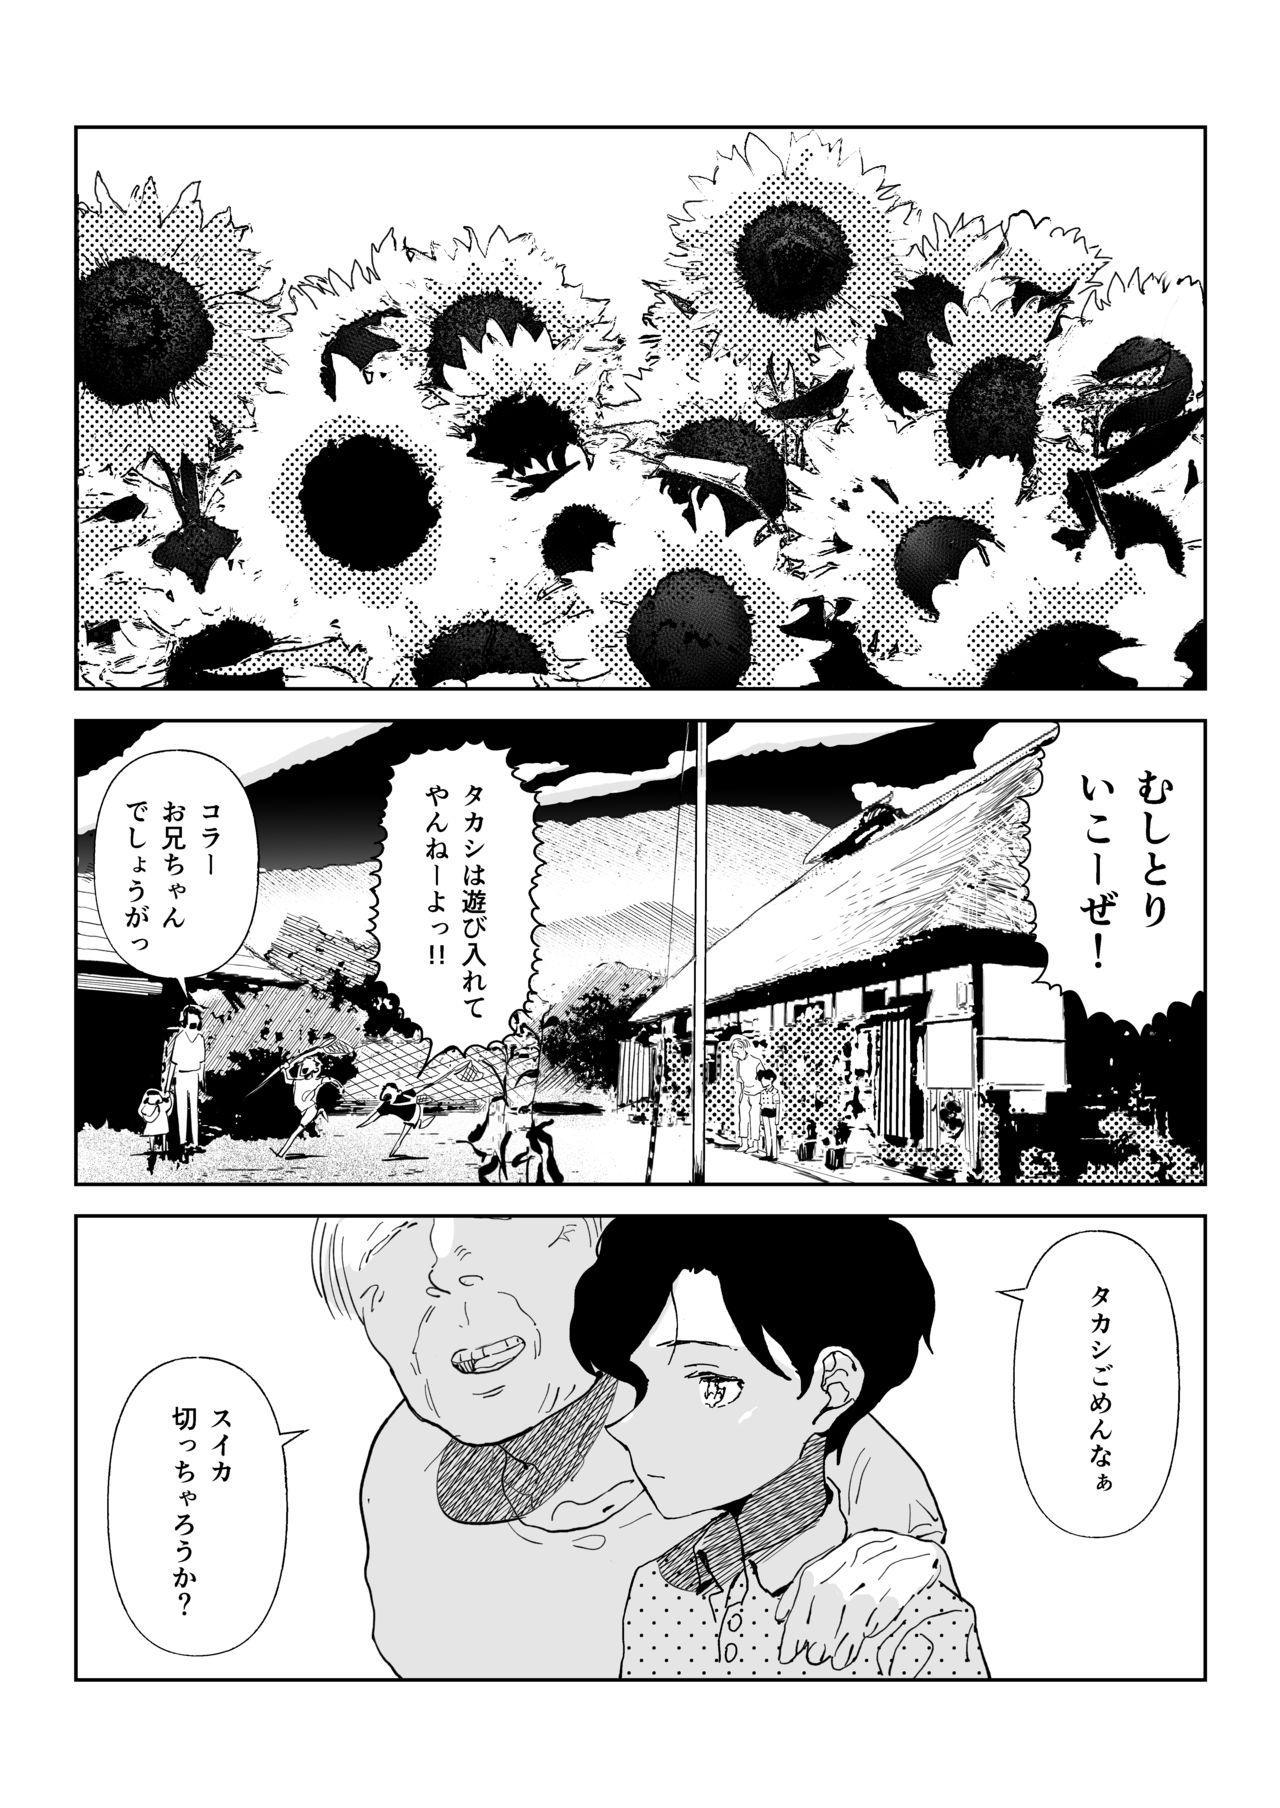 Nagisa no Kyonyuu Onee-san 1